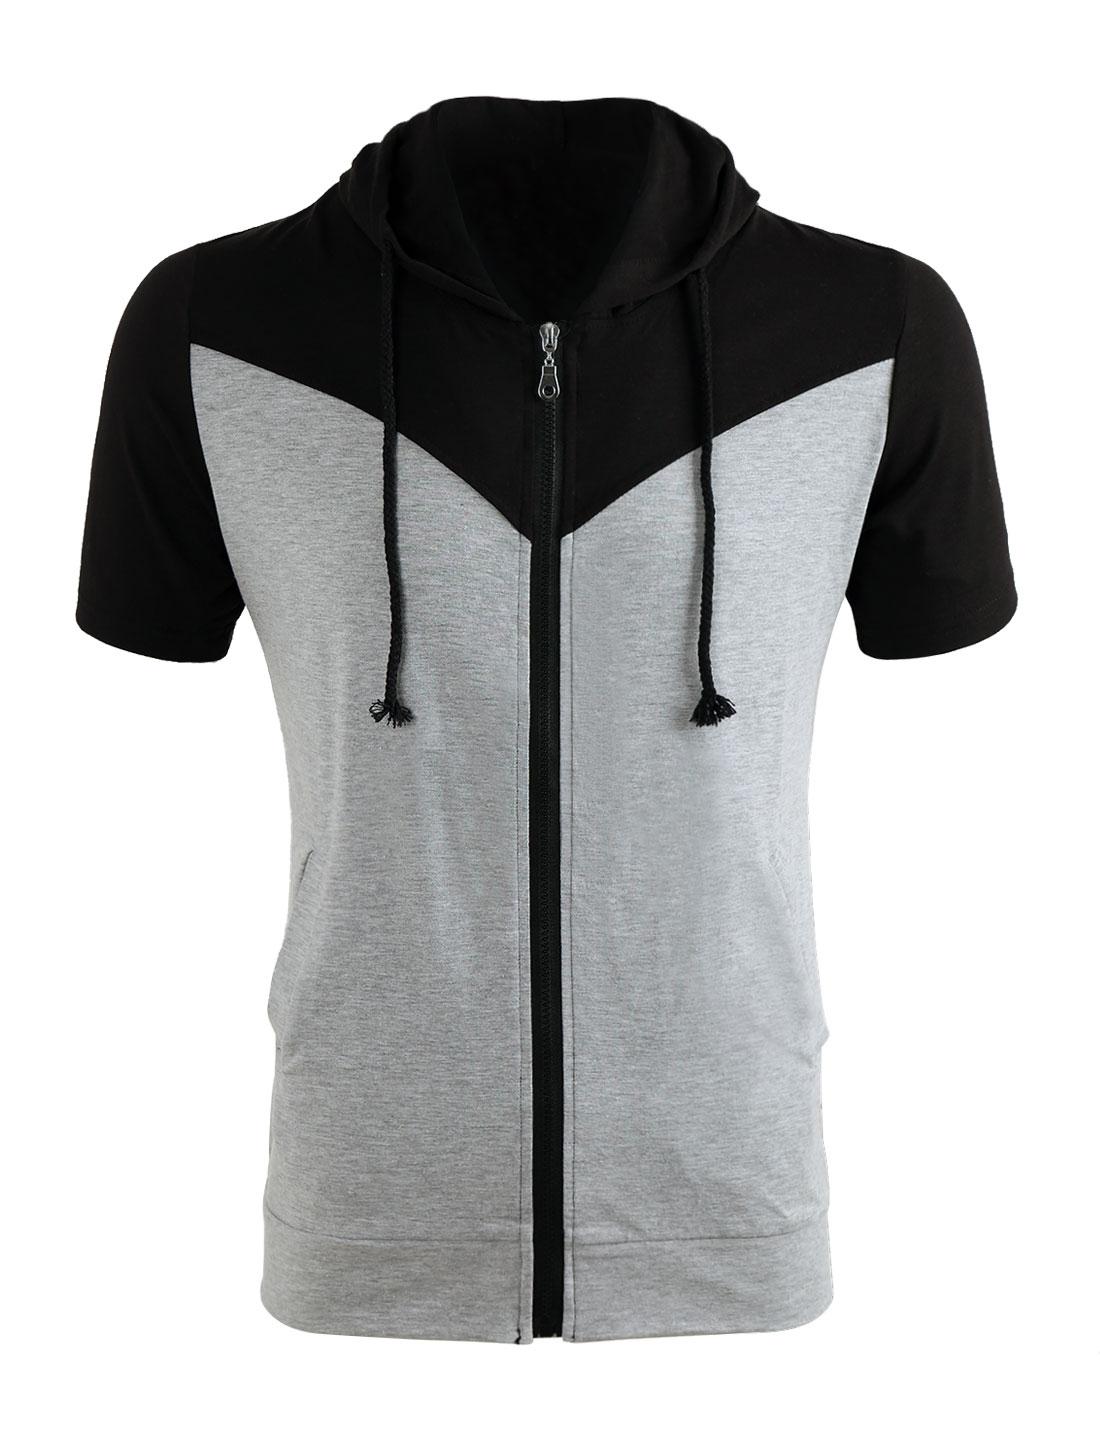 Men Black Gray Zipper Short Sleeve Color Block Sweatshirt M